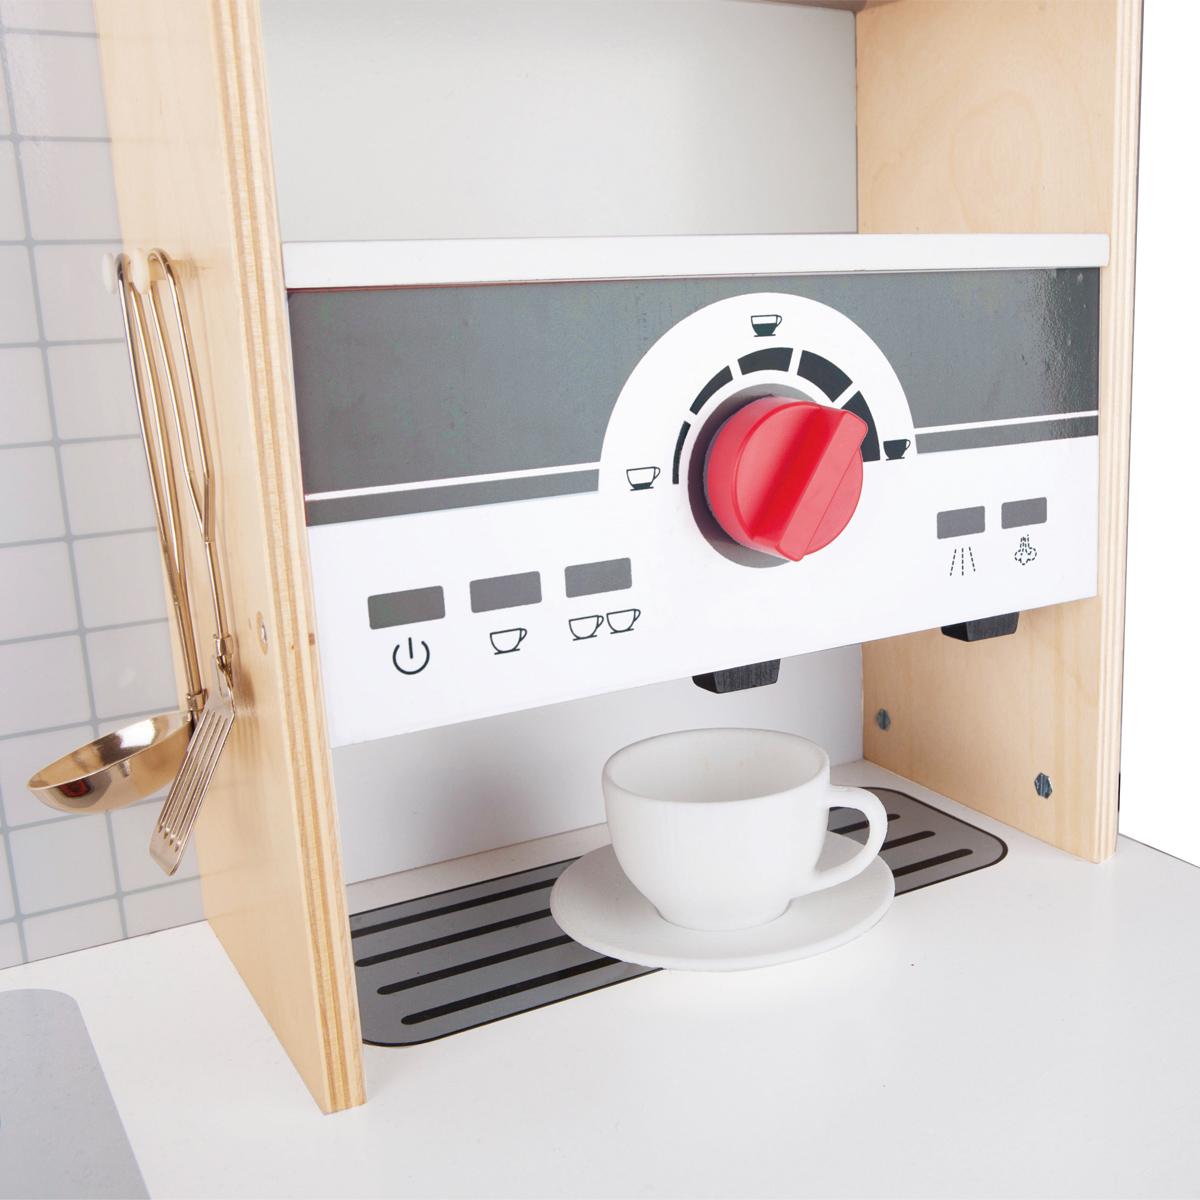 hape multifunktionale spielk che aus holz e3145 pirum. Black Bedroom Furniture Sets. Home Design Ideas